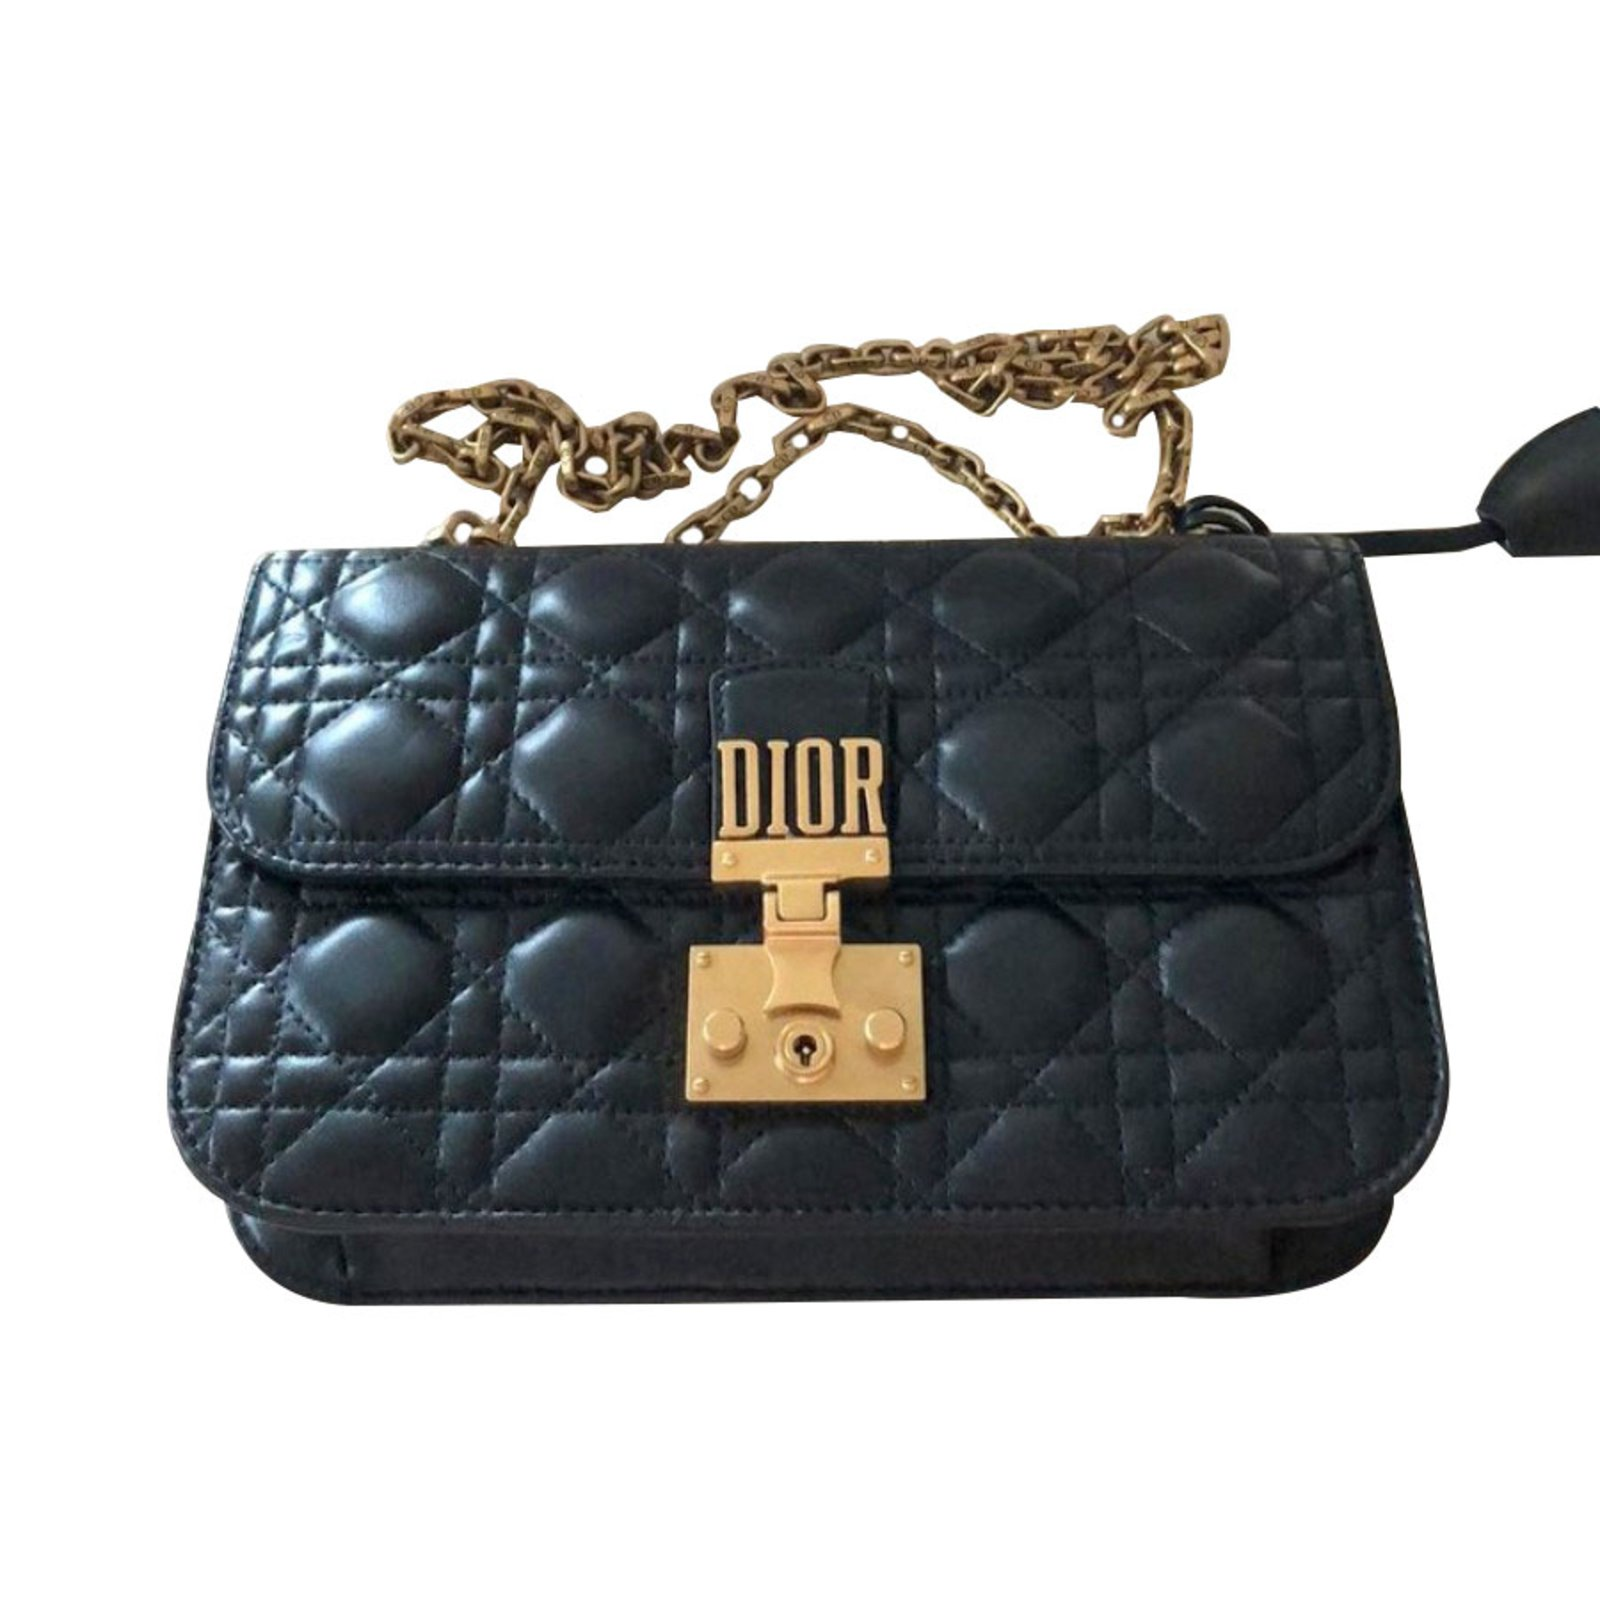 Dior Handbags Leather Black